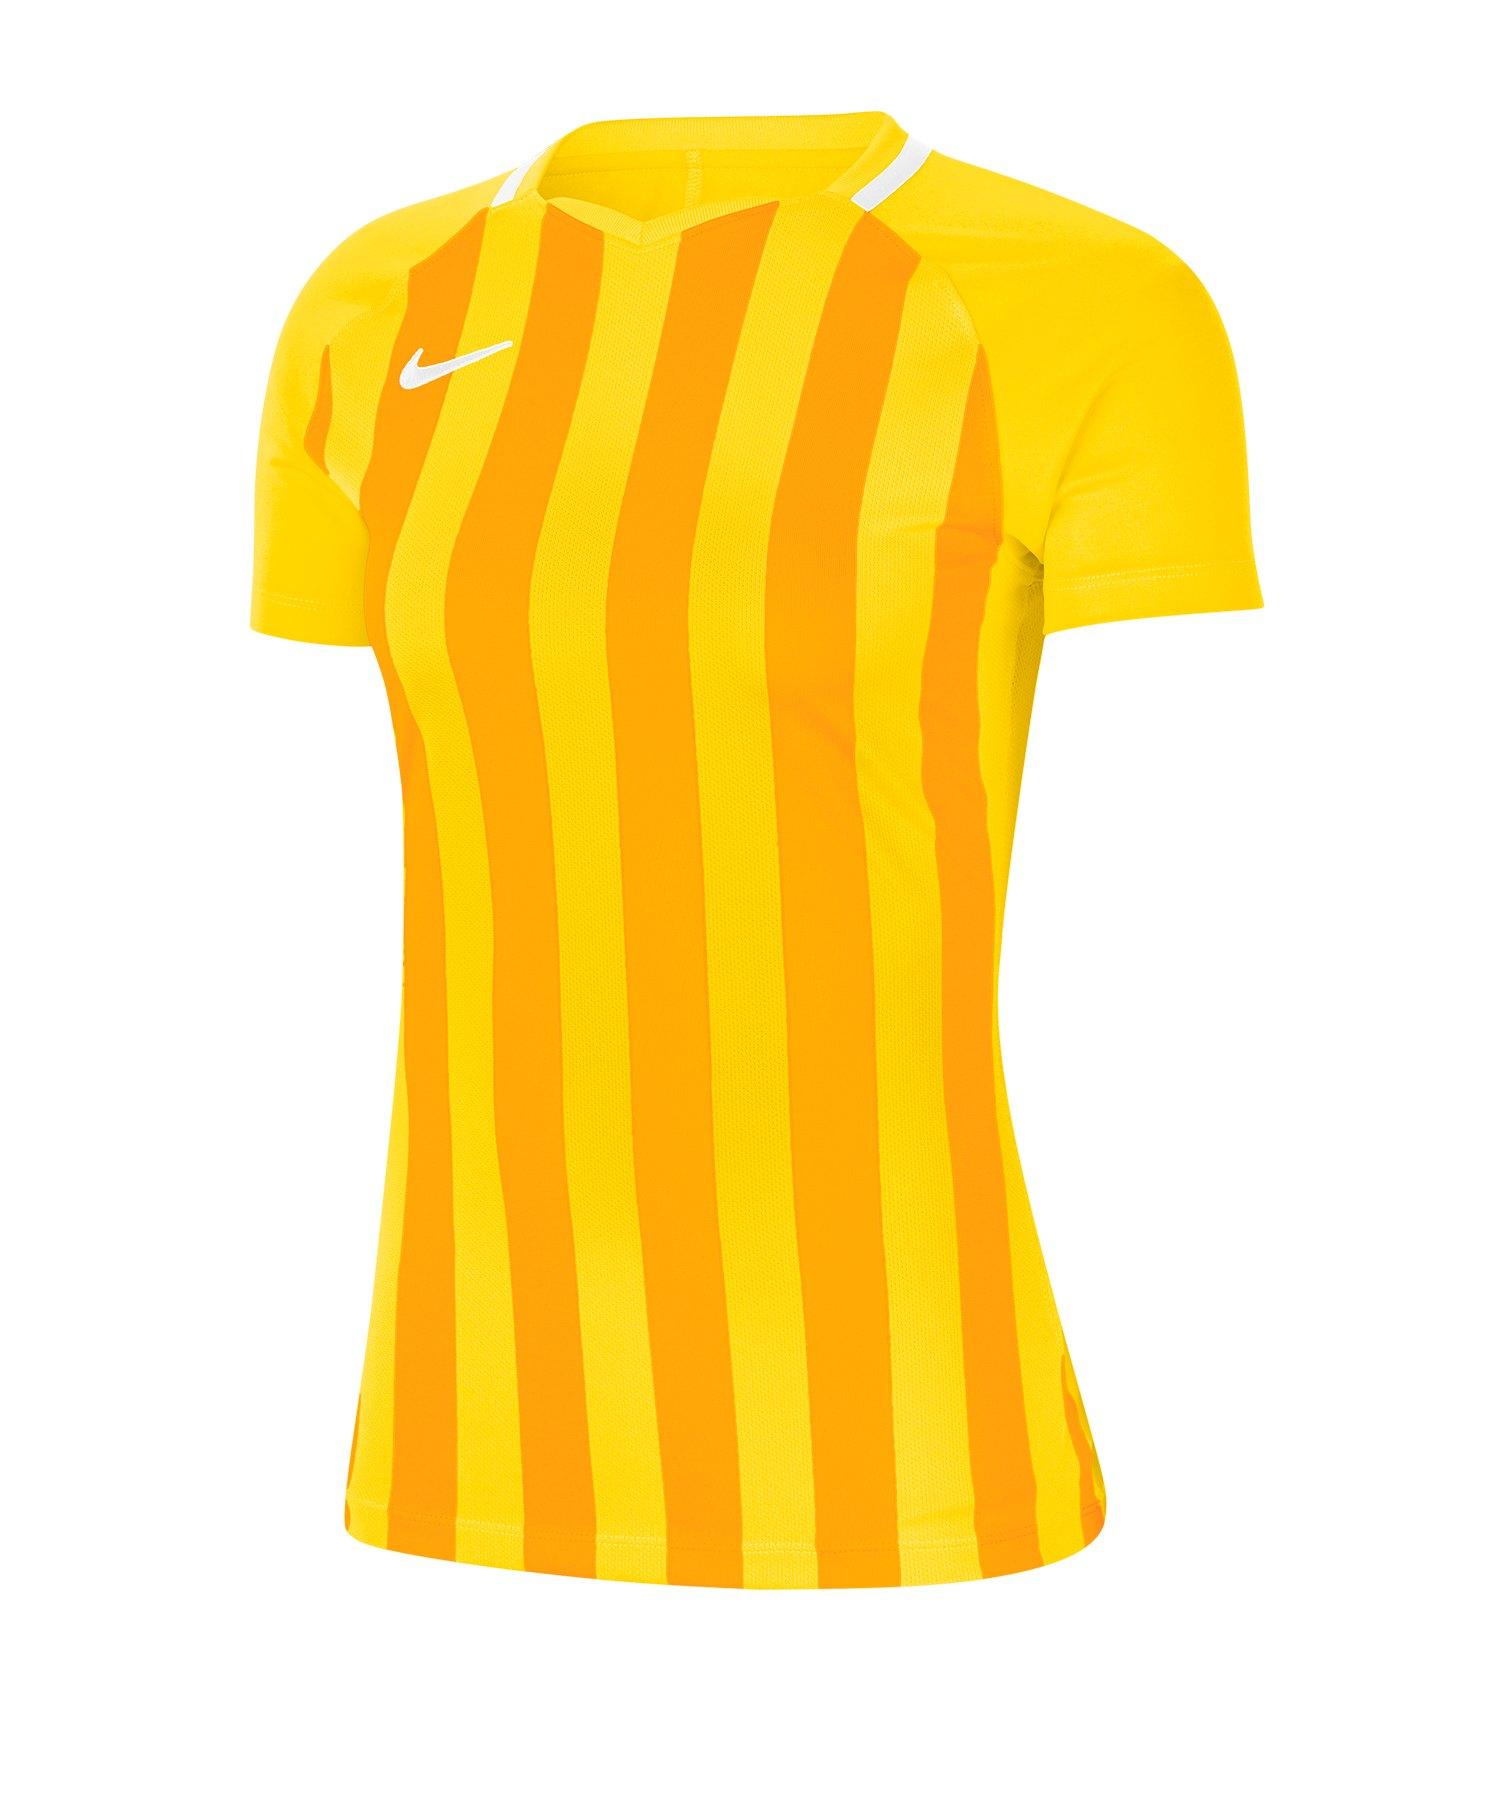 Nike Striped Division III Trikot KA Damen F719 - gelb